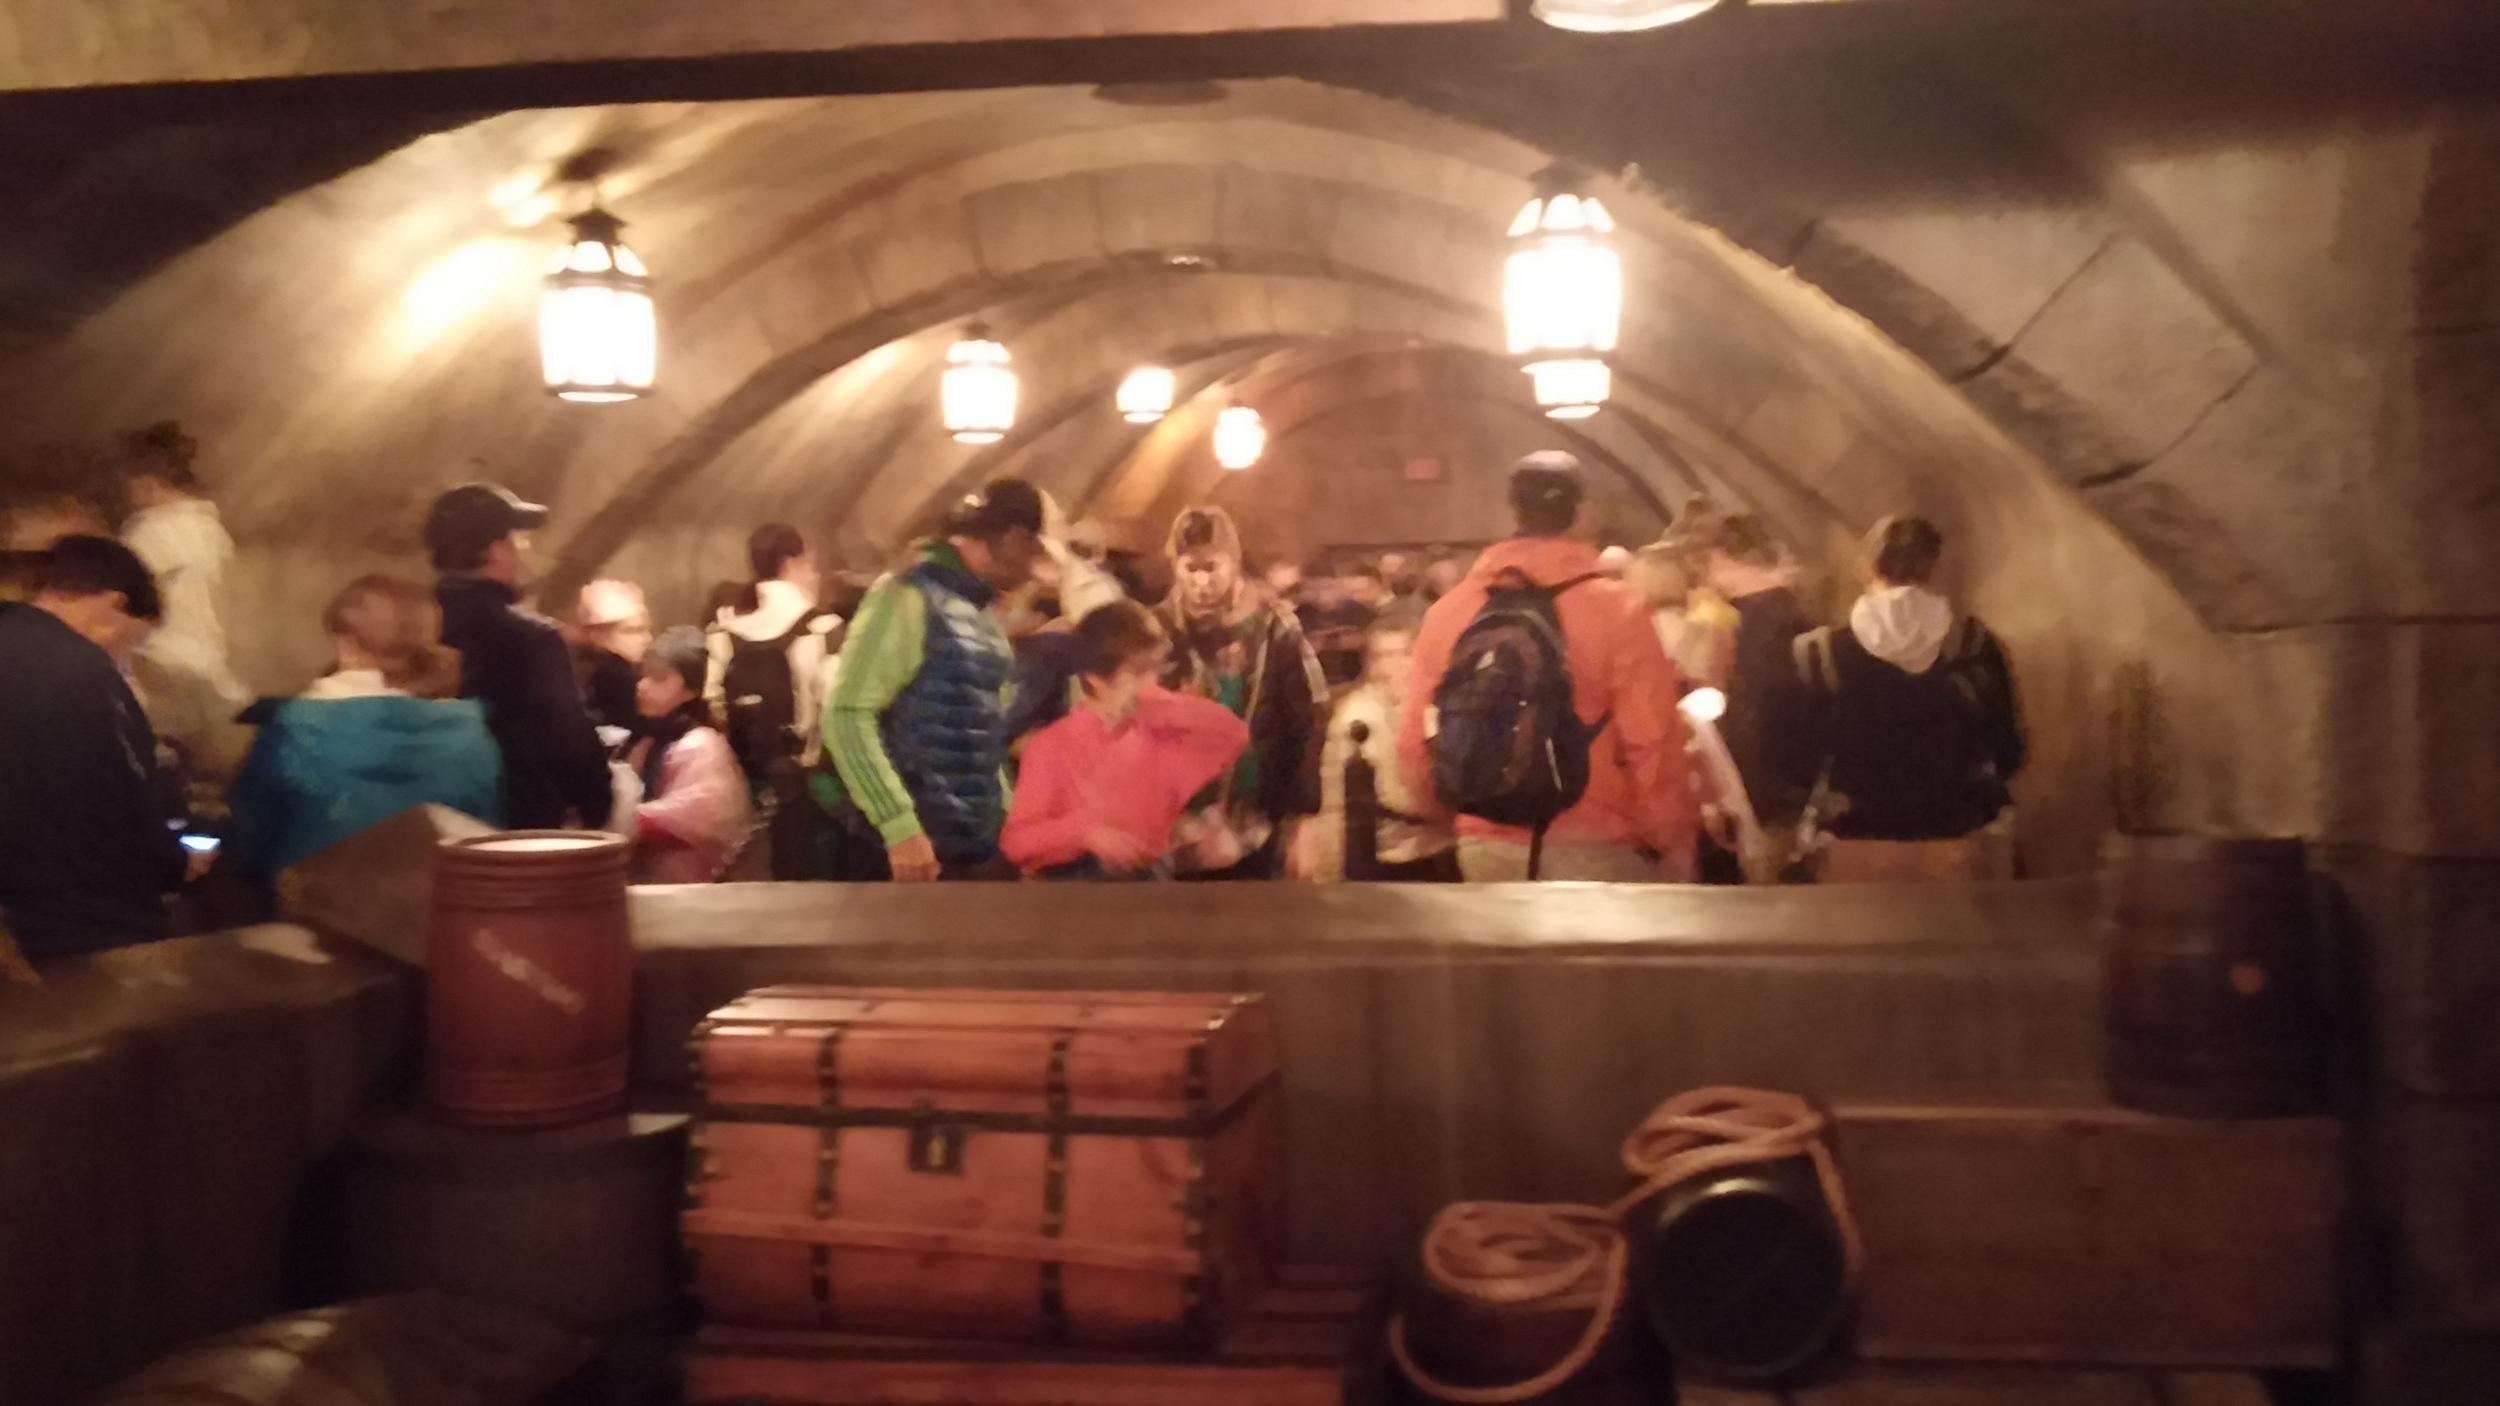 Magic Kingdom Pirates of the Caribbean -- the regular line